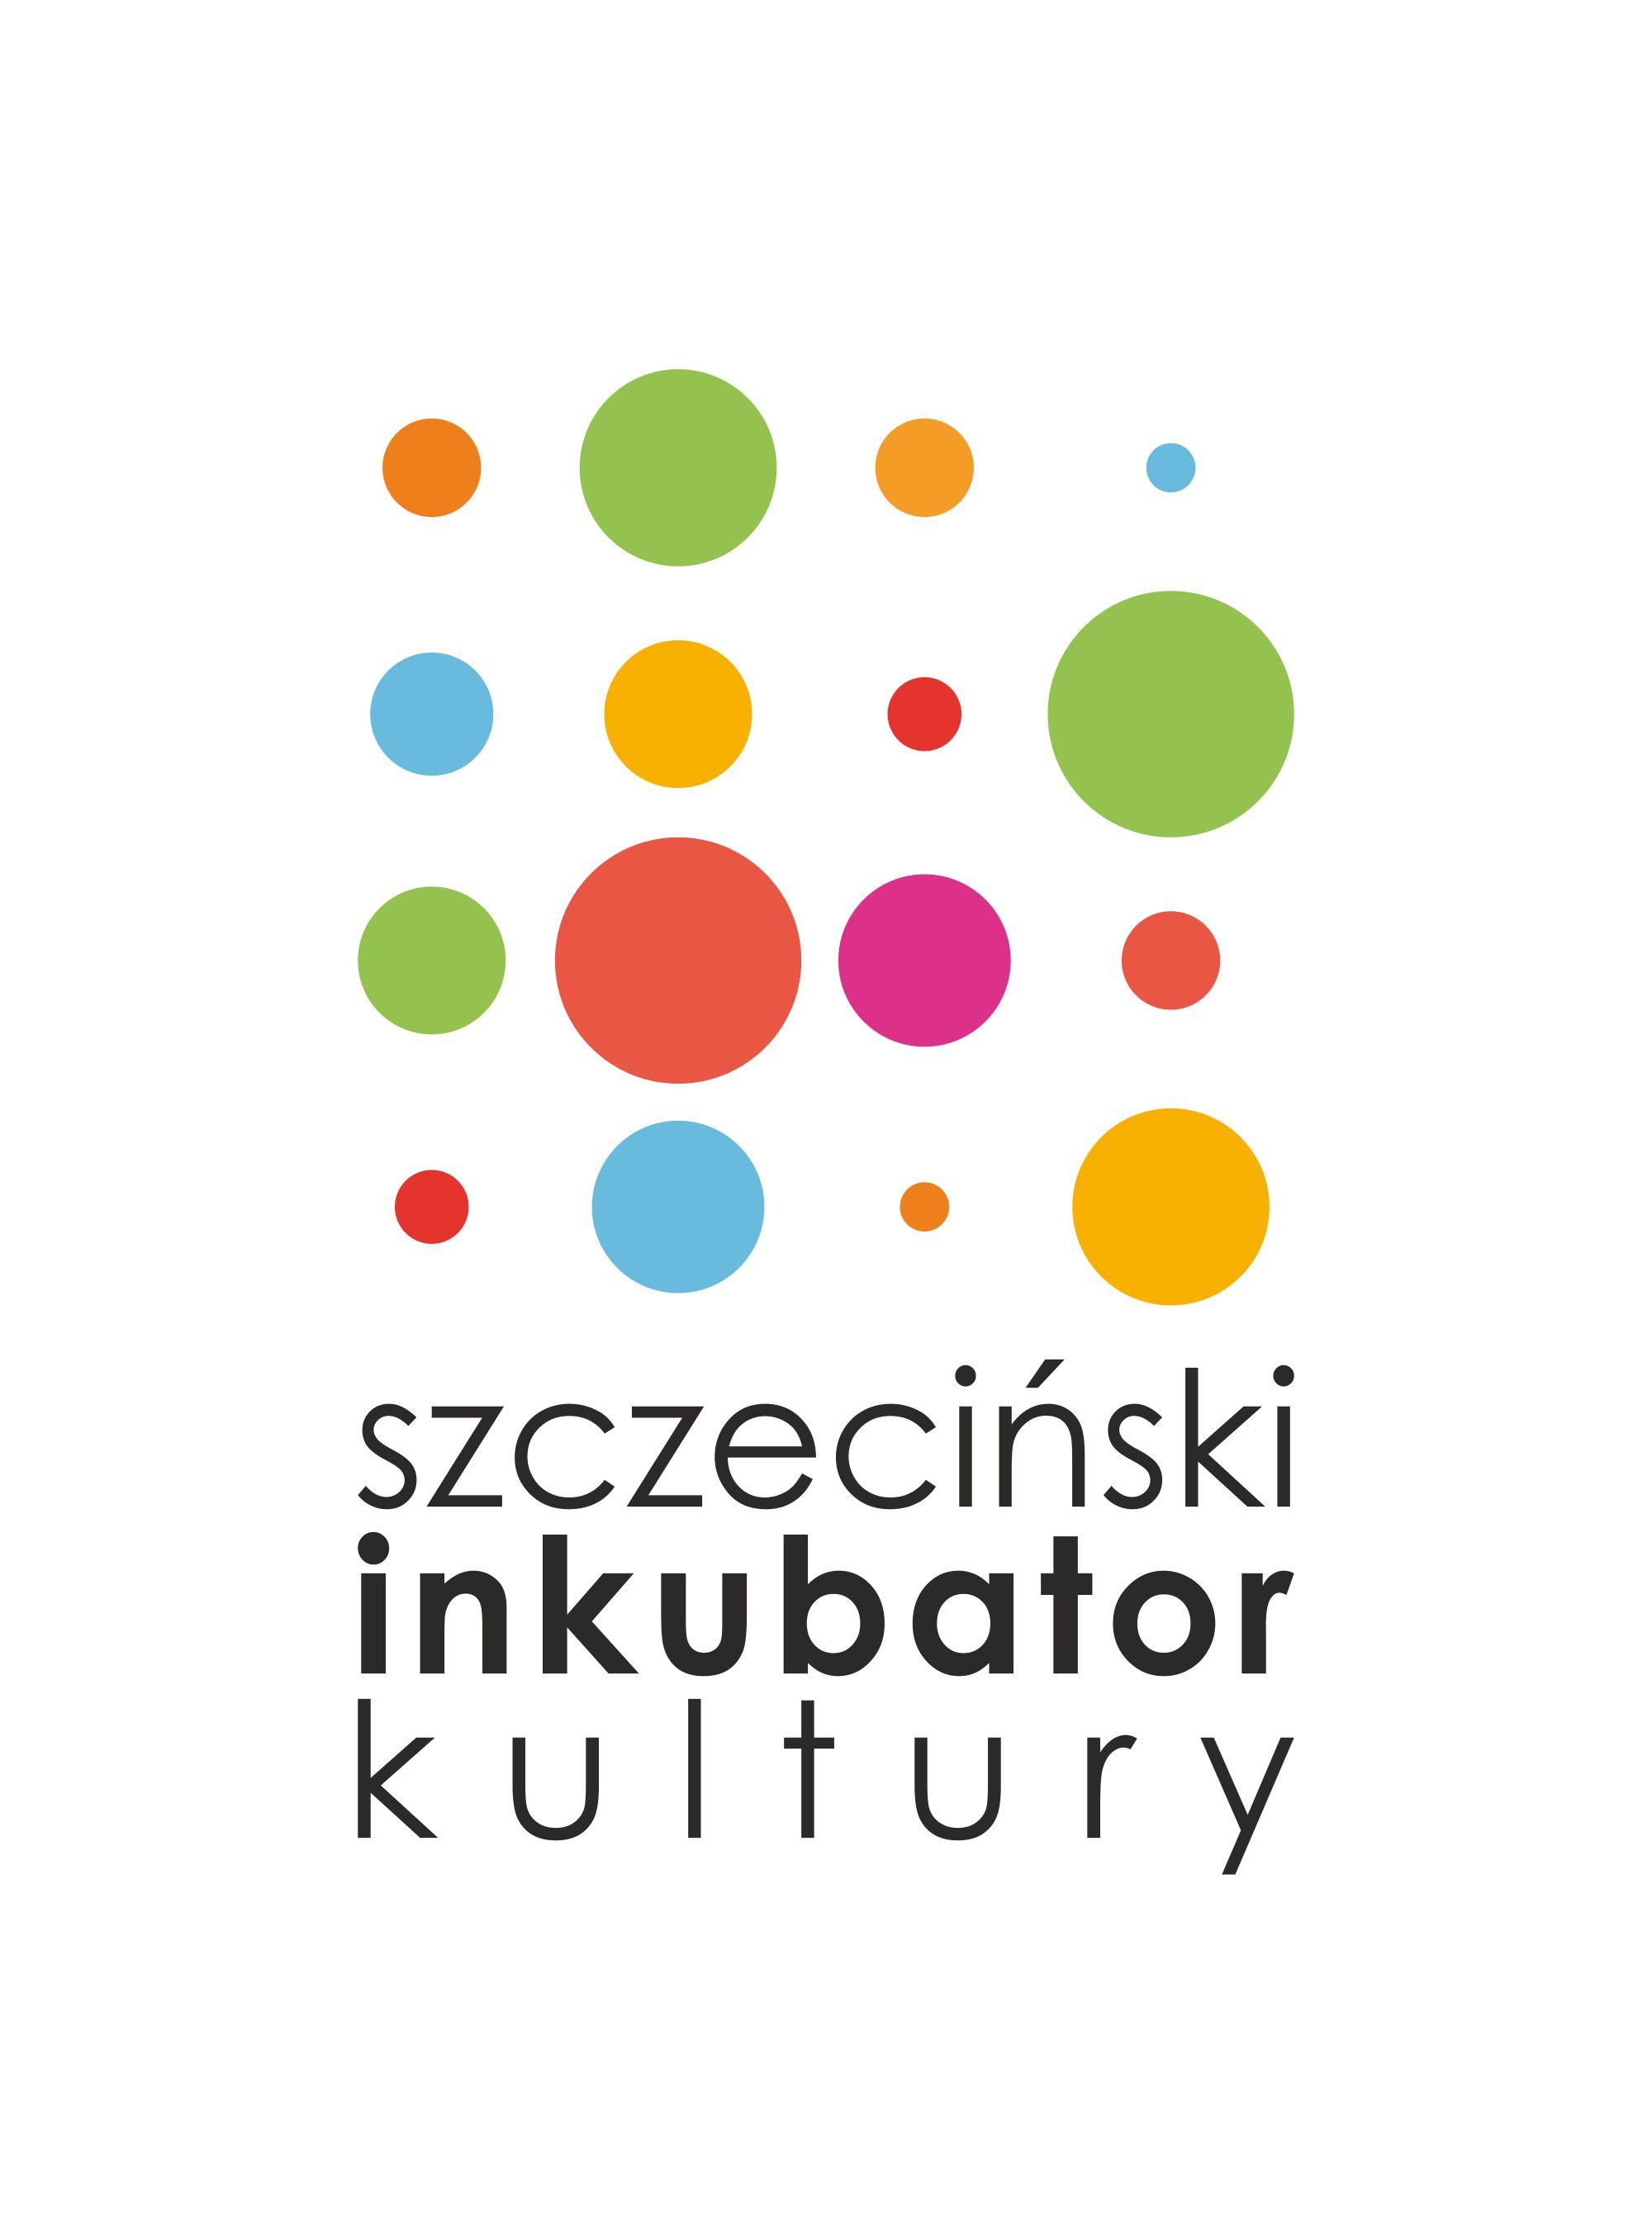 LOGO Szczecinski Inkubator Kultury